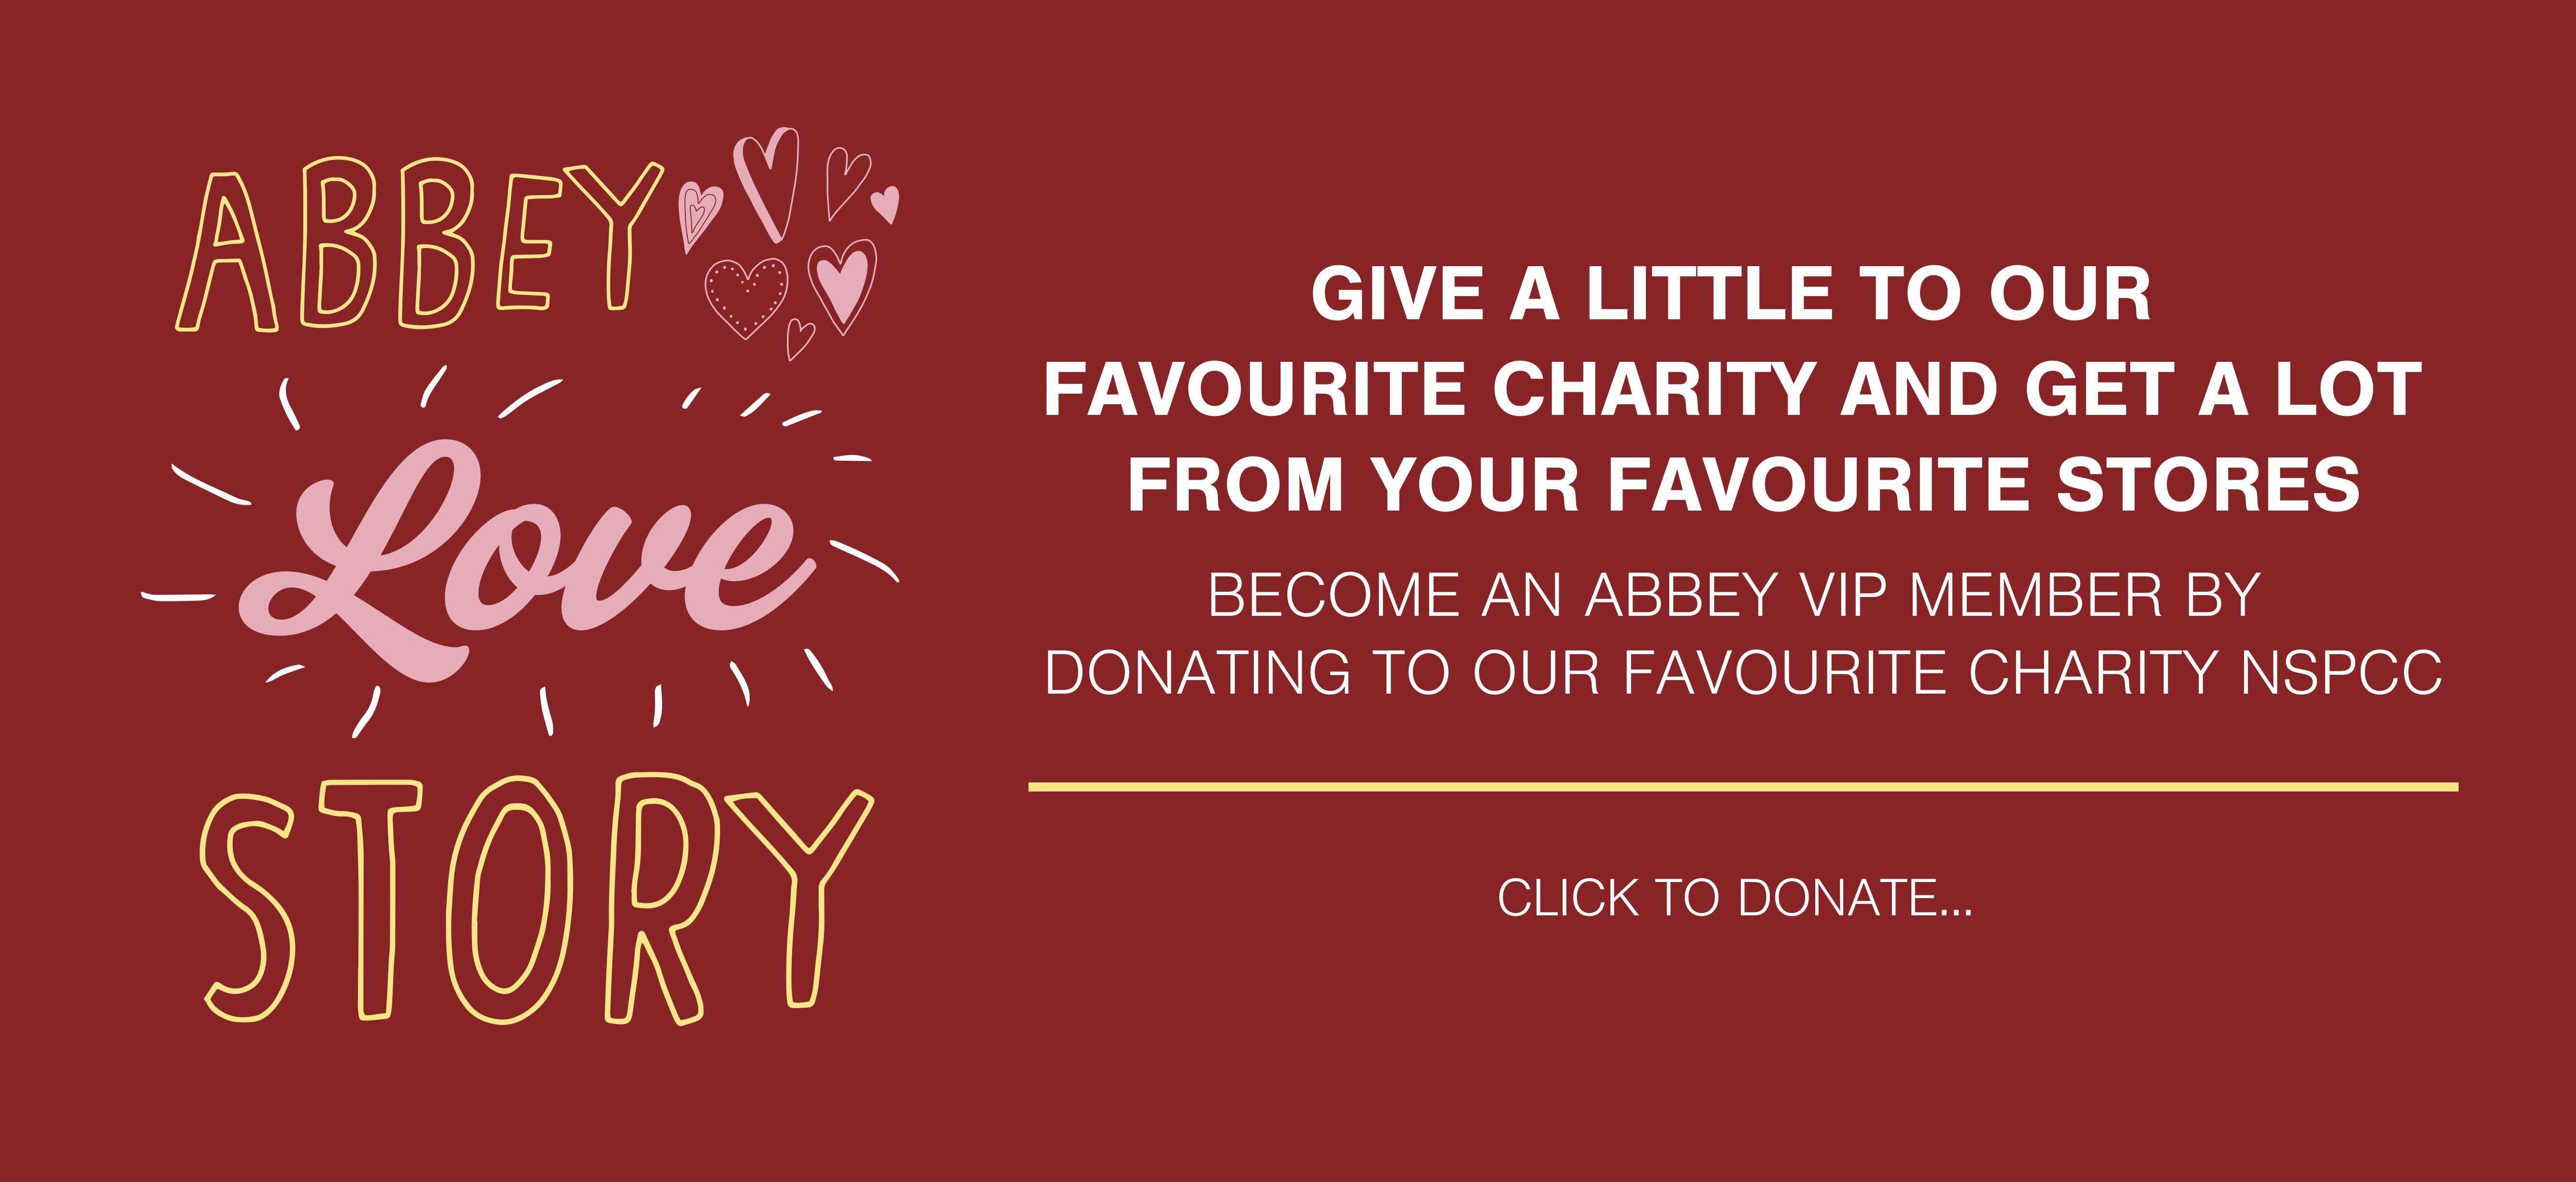 209493 AC Abbey Love Story Web Banner v2